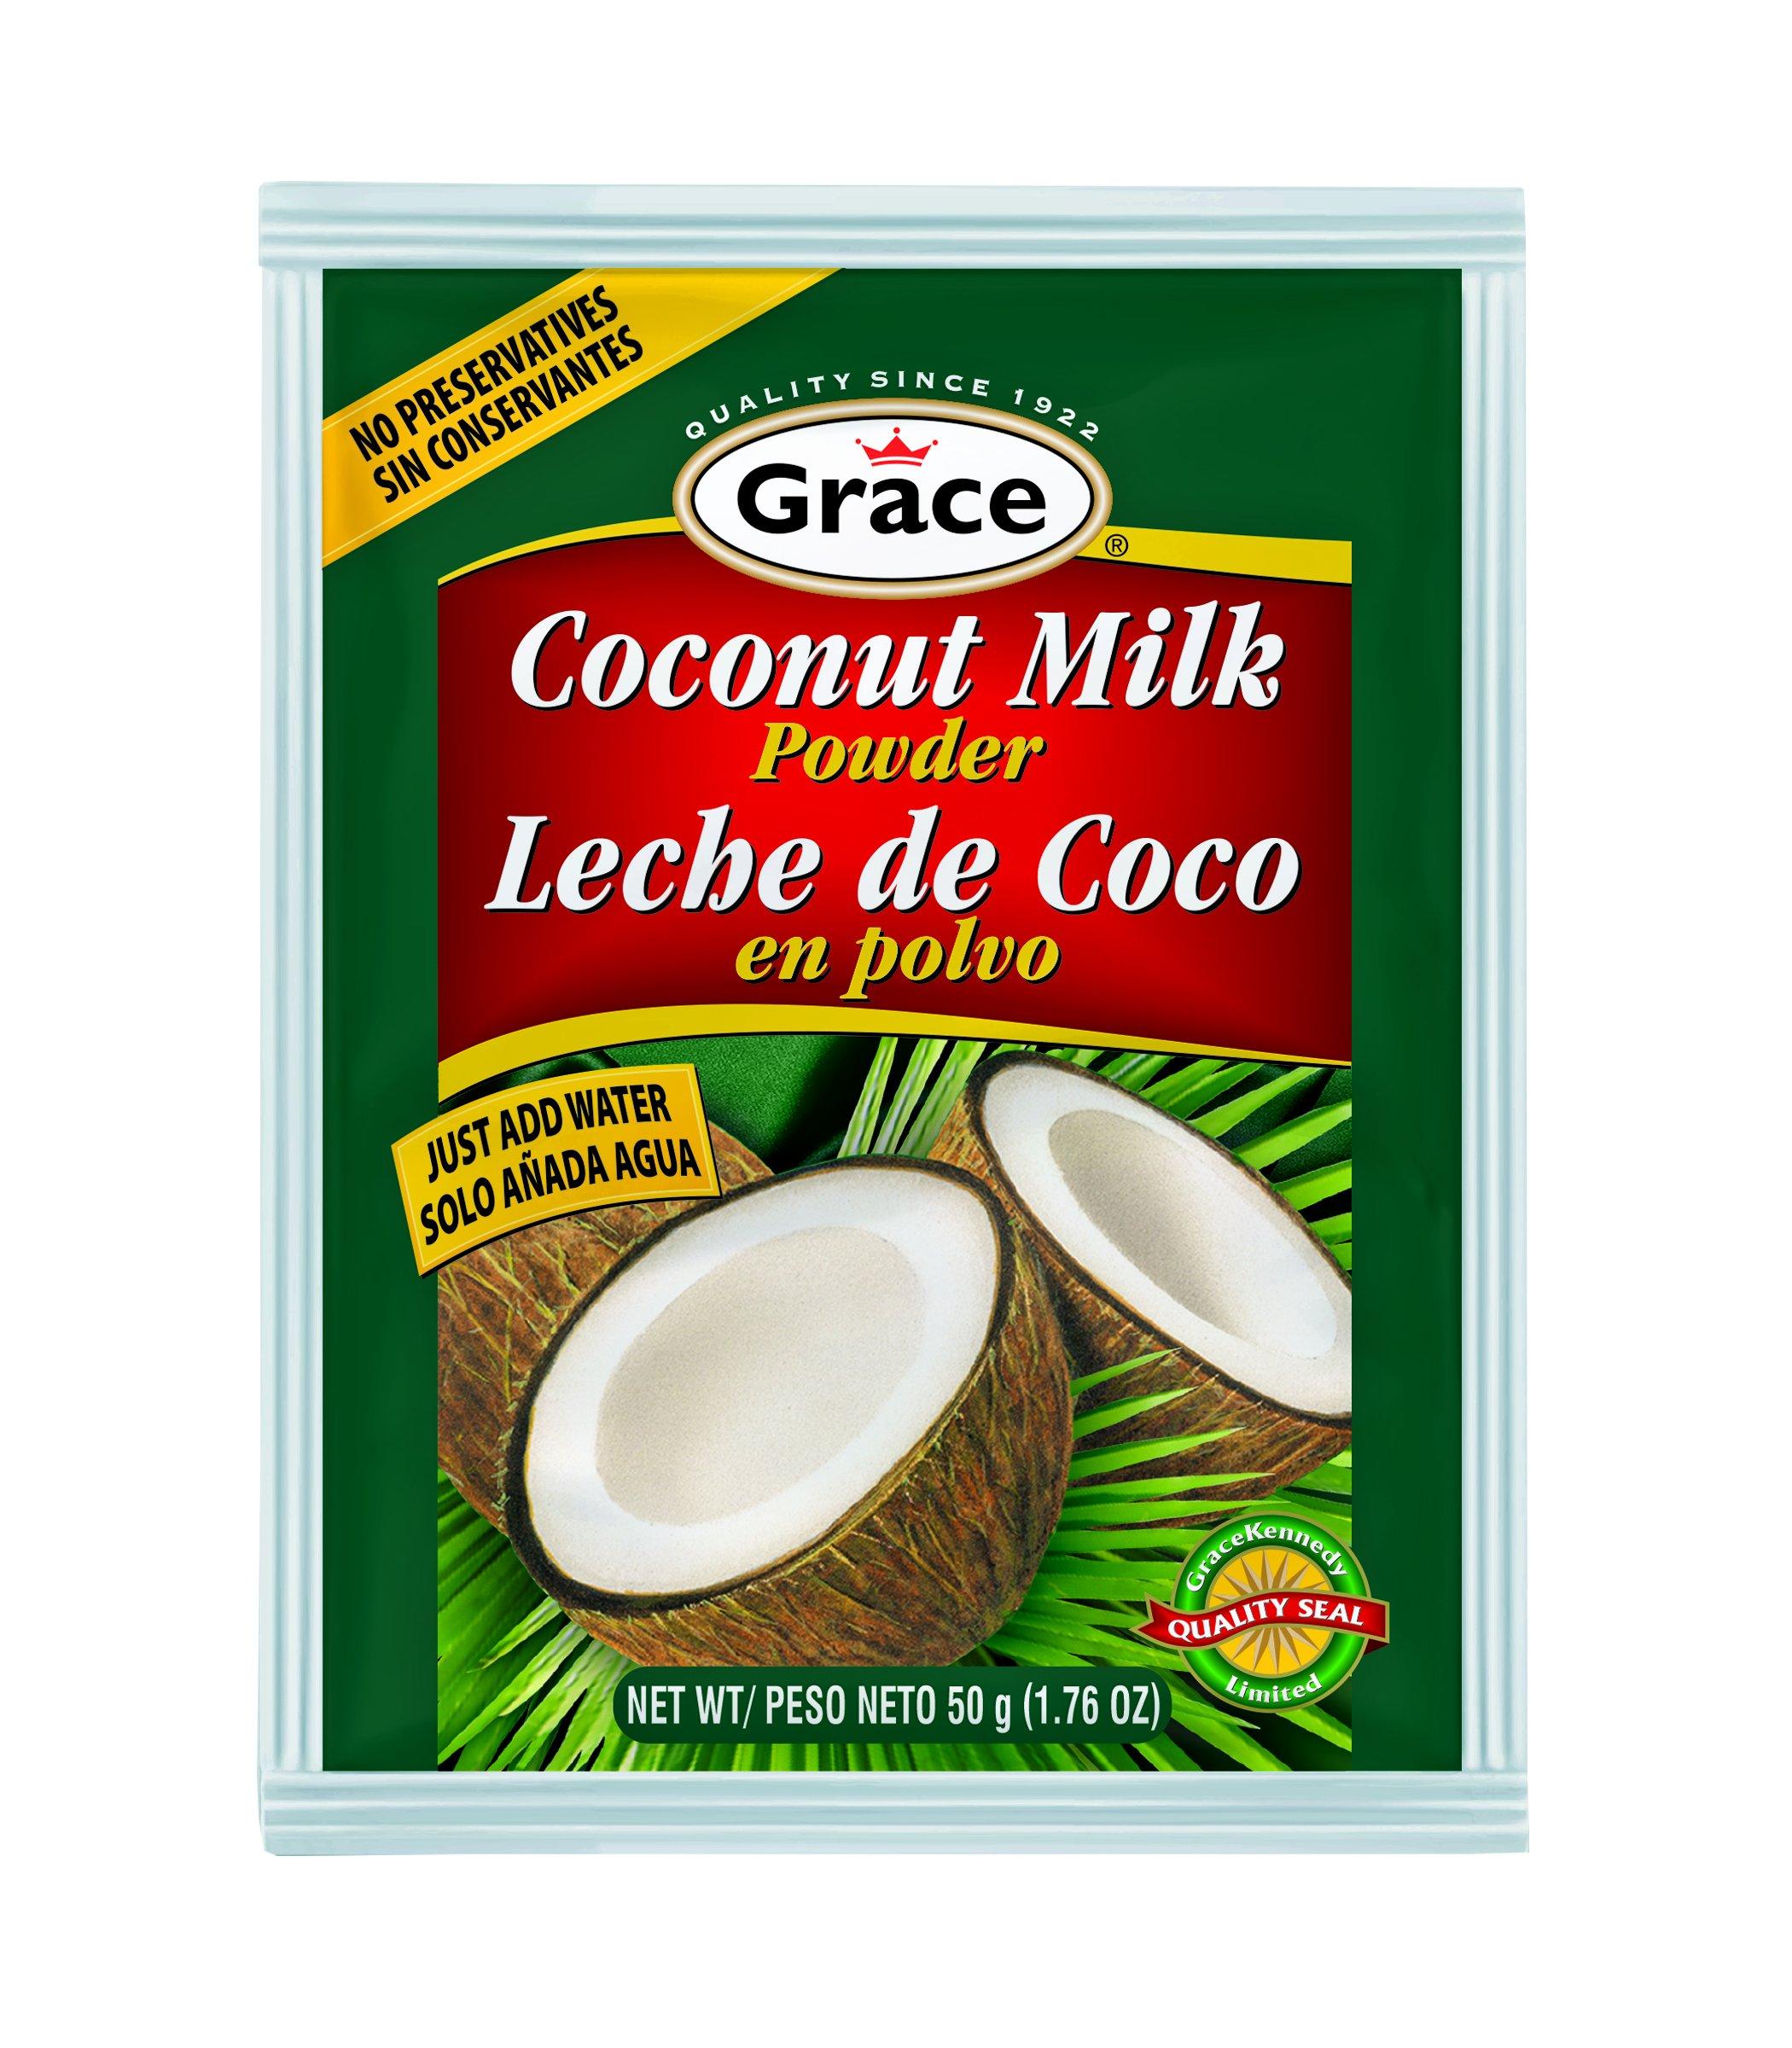 Grace Coconut Milk Powder (USA) 36 Pack by Grace